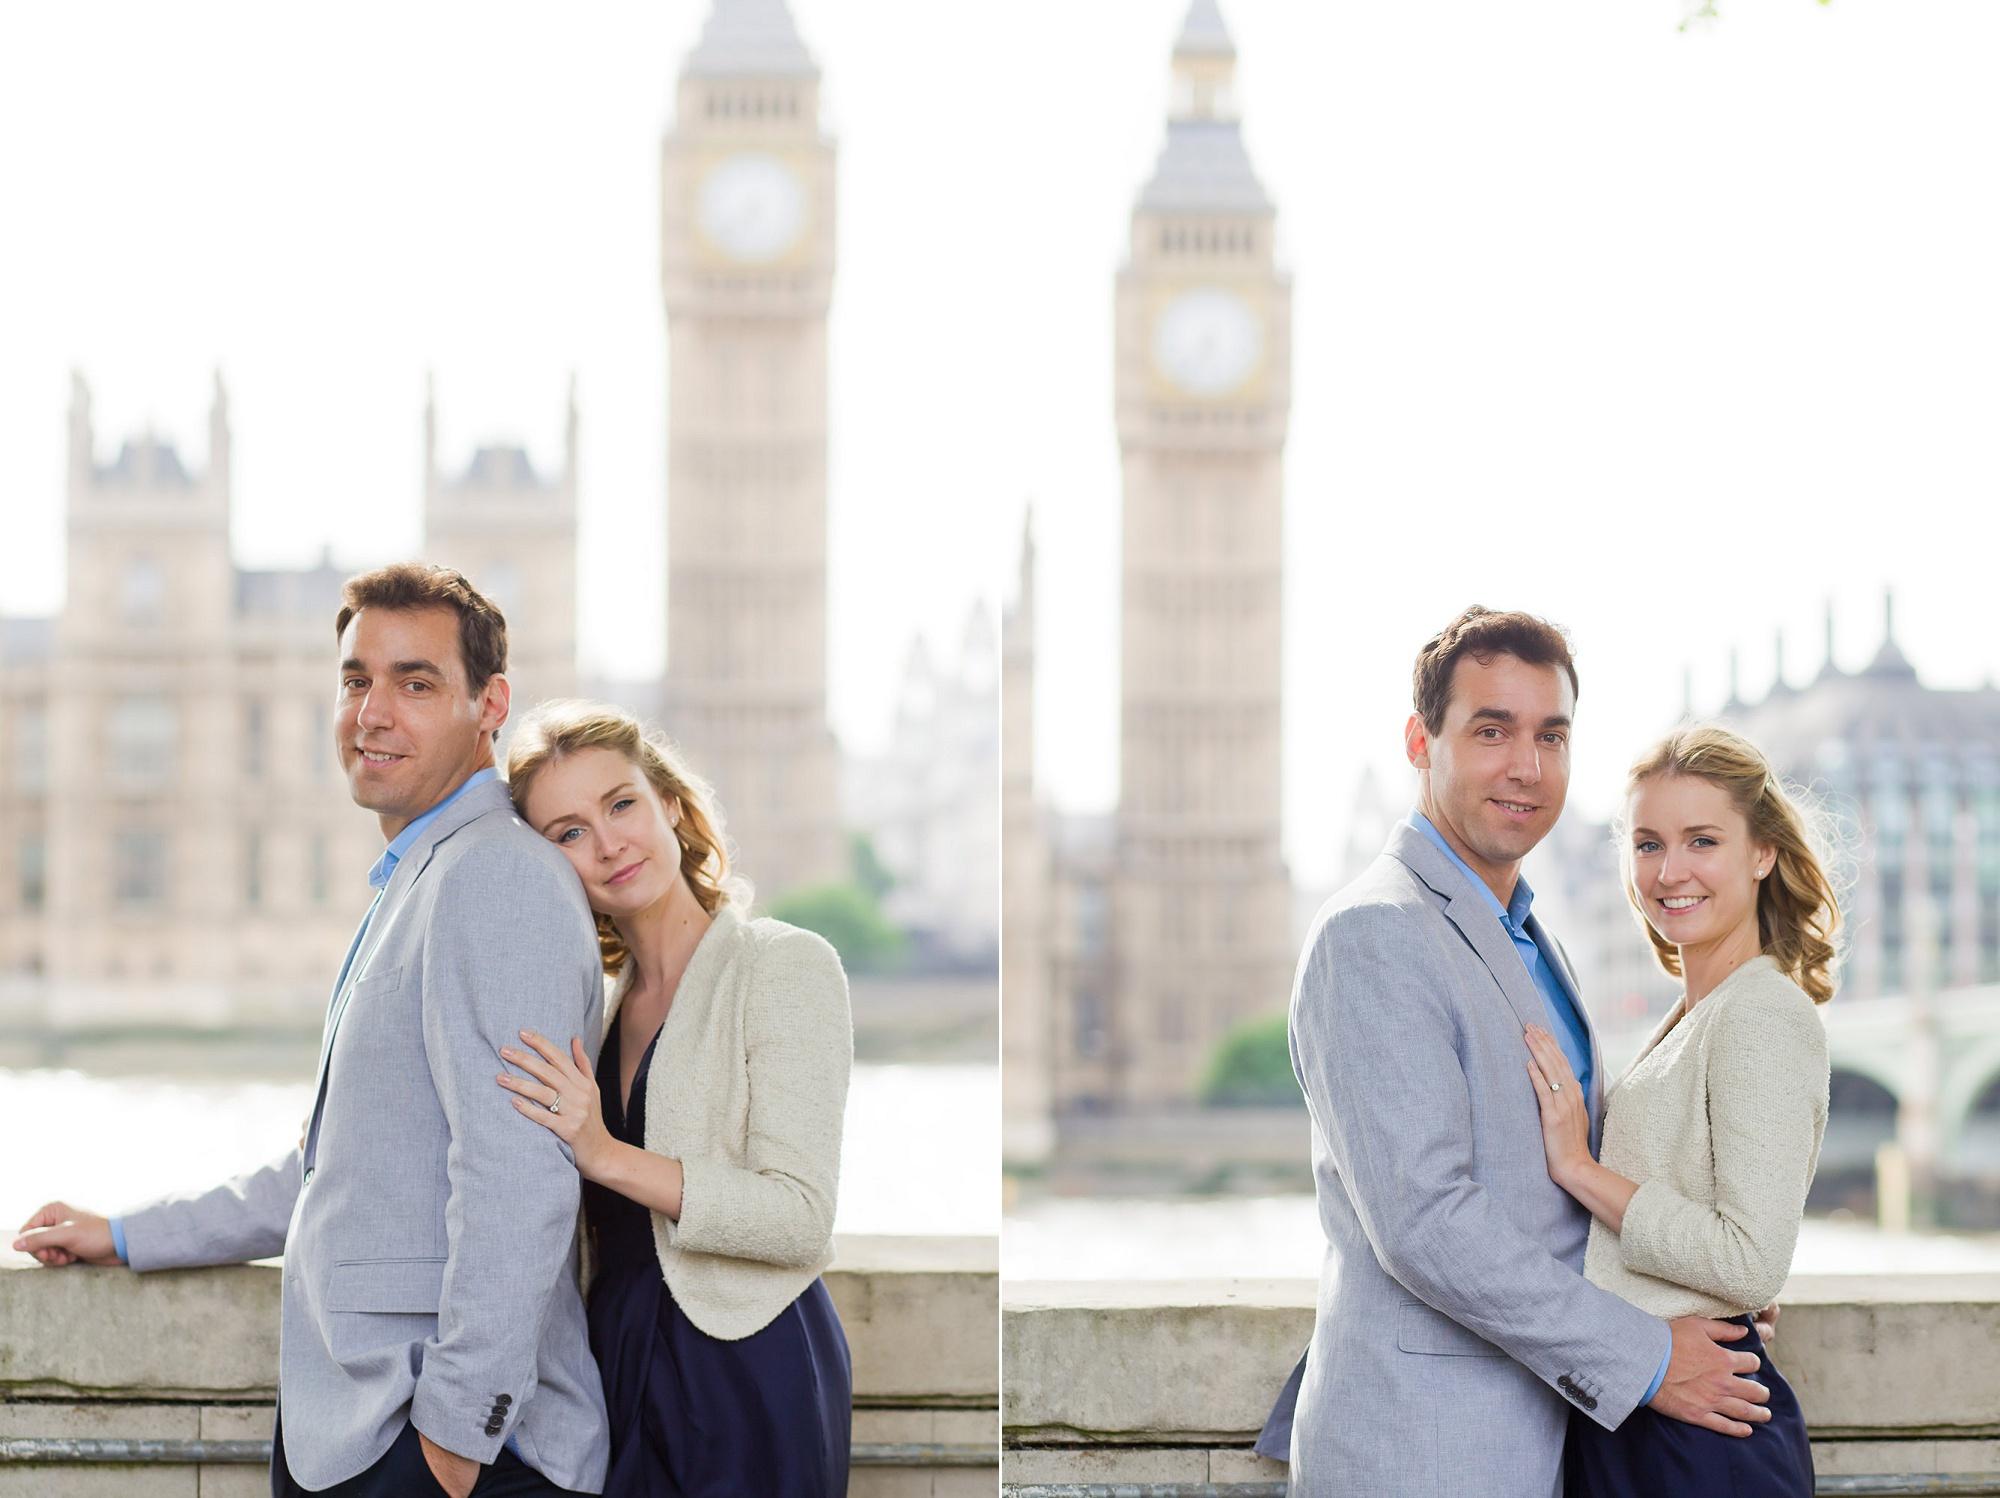 engagement photos across from big ben london